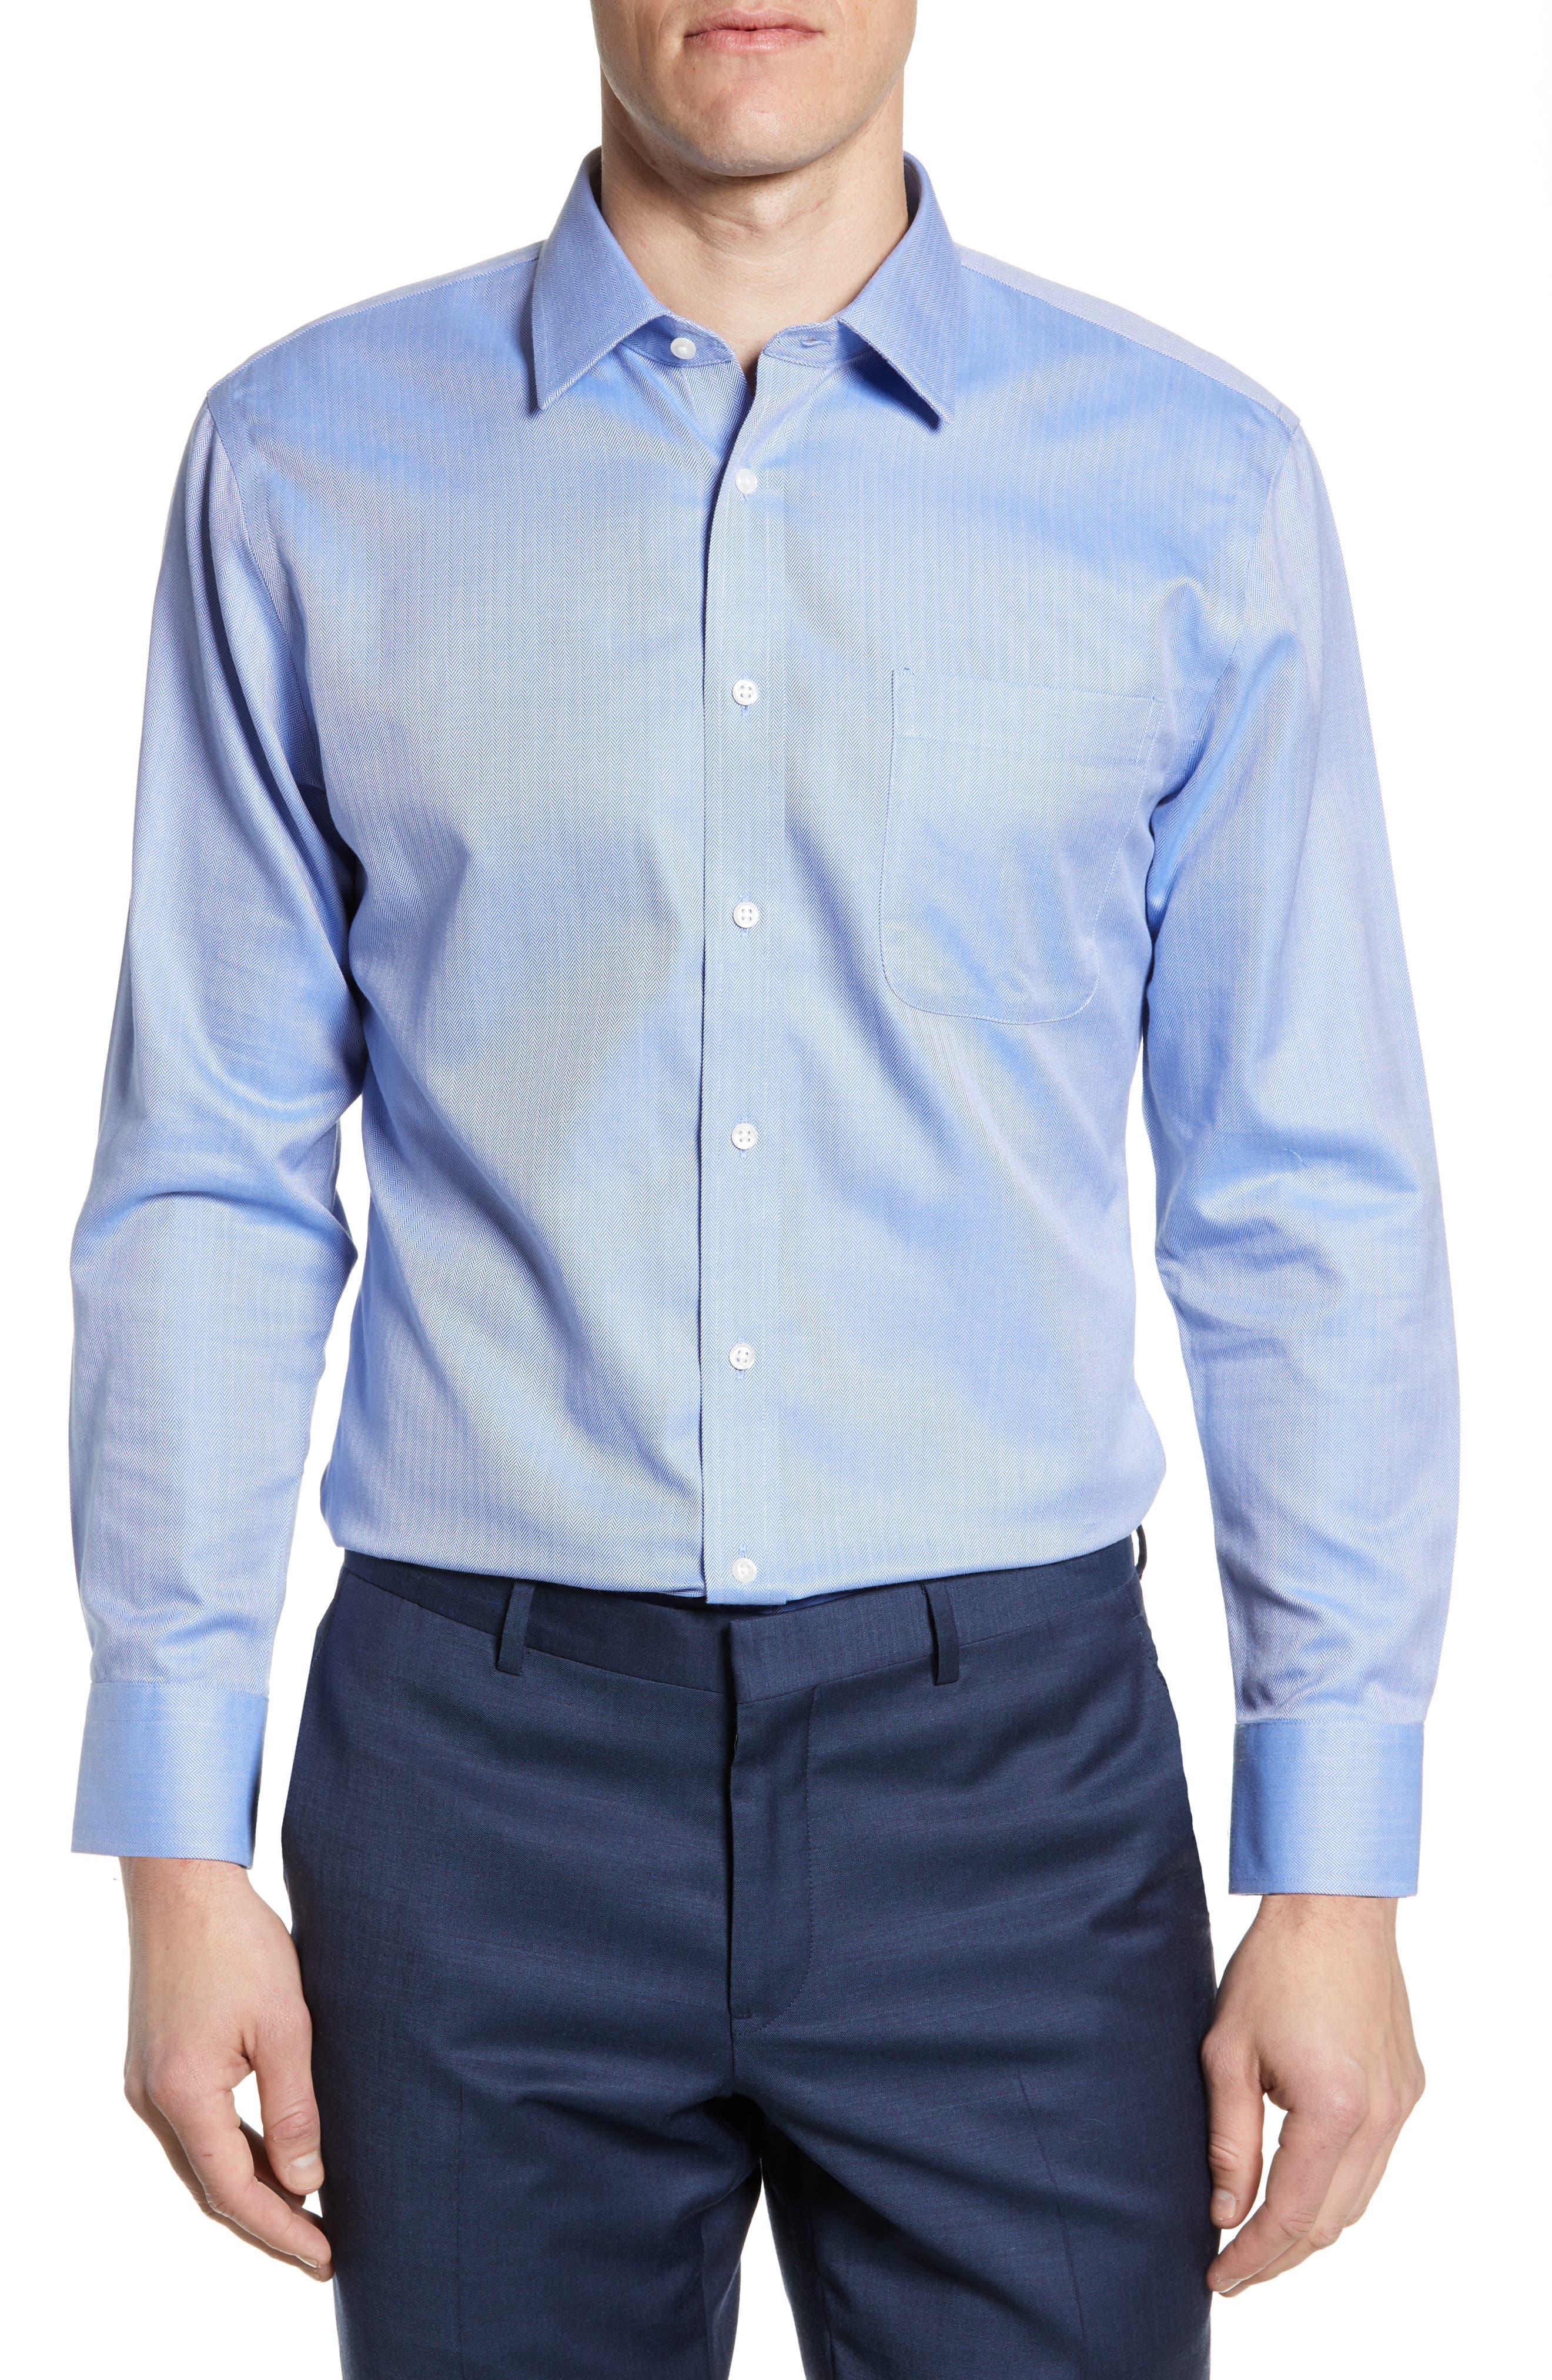 Nordstrom Shop Smartcare(TM) Trim Fit Herringbone Dress Shirt - Blue